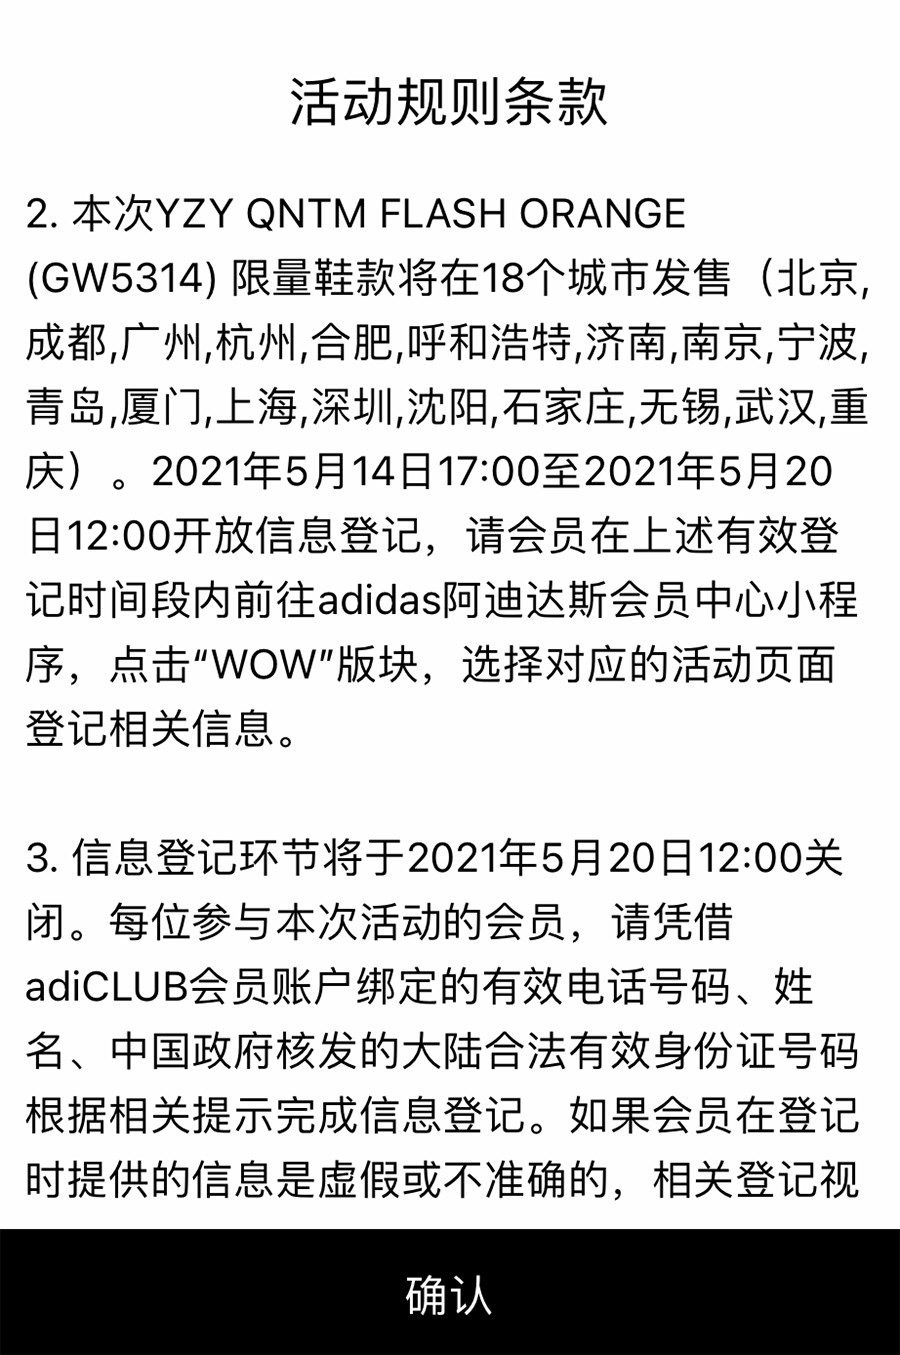 Yeezy,QNTM,GW5314  仅 18 个城市登记!「闪光橙」Yeezy 新品上架!货量预计不大!